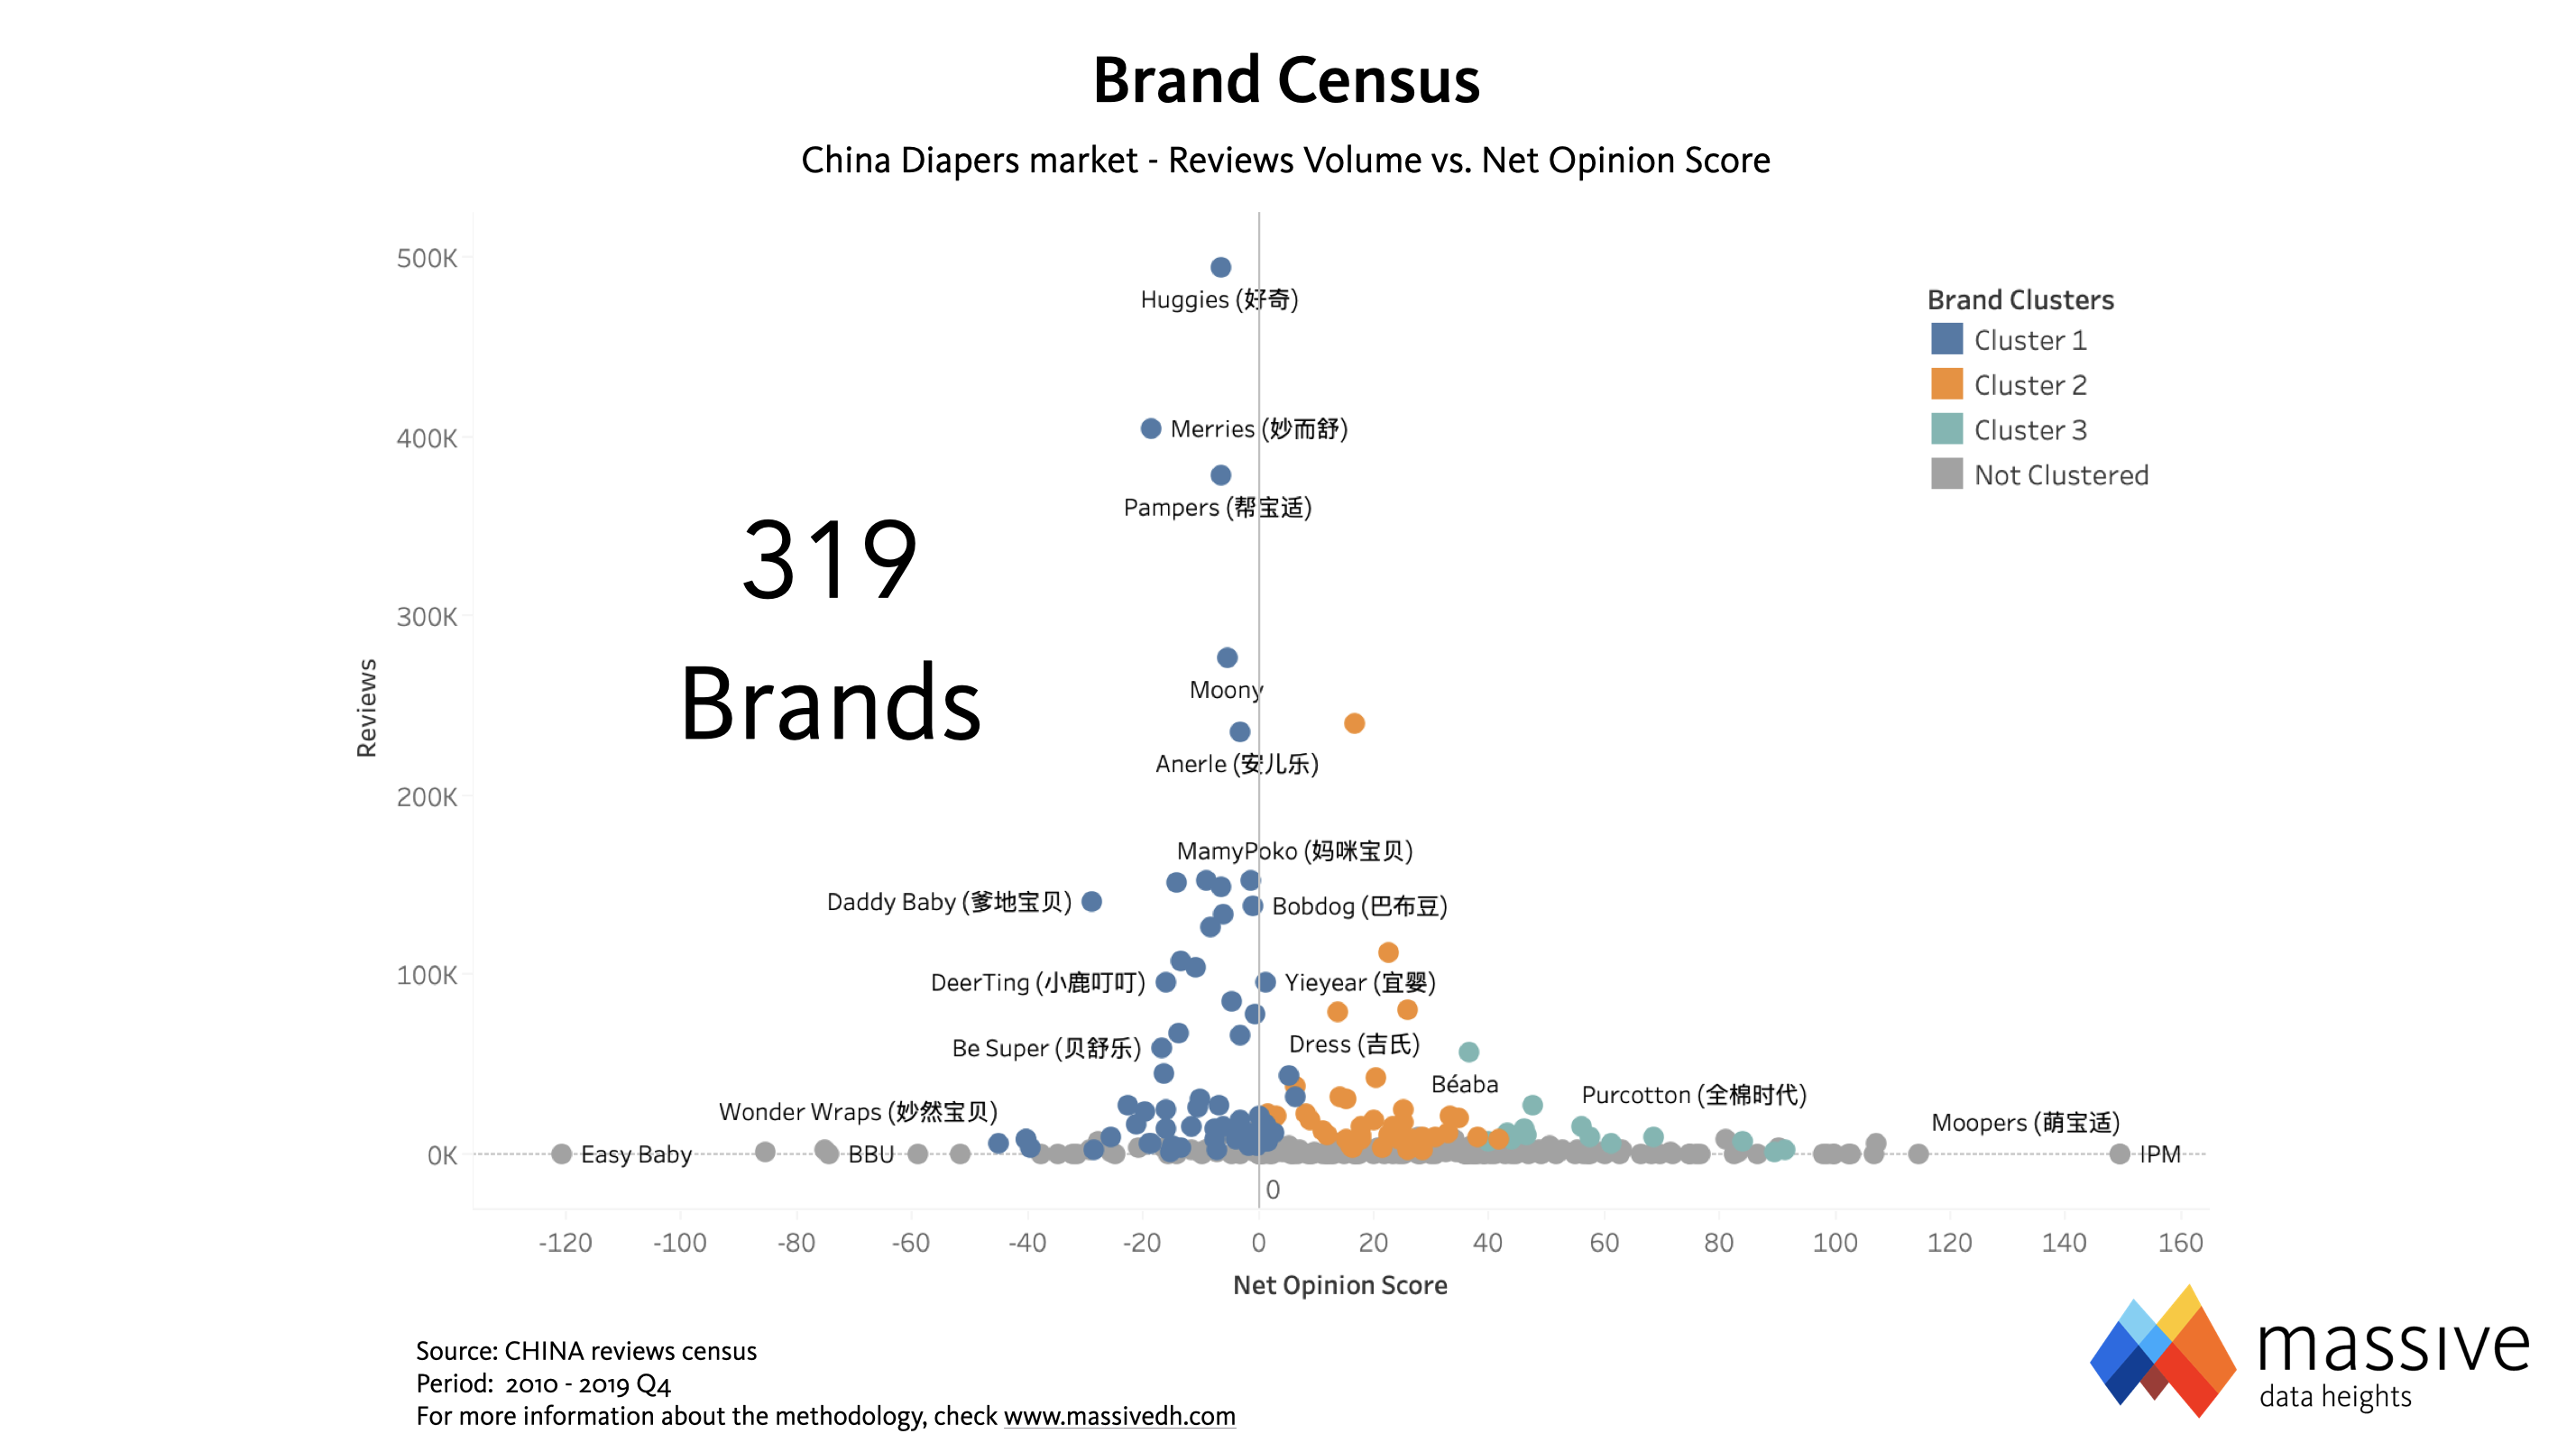 MASSIVE - Brand Census